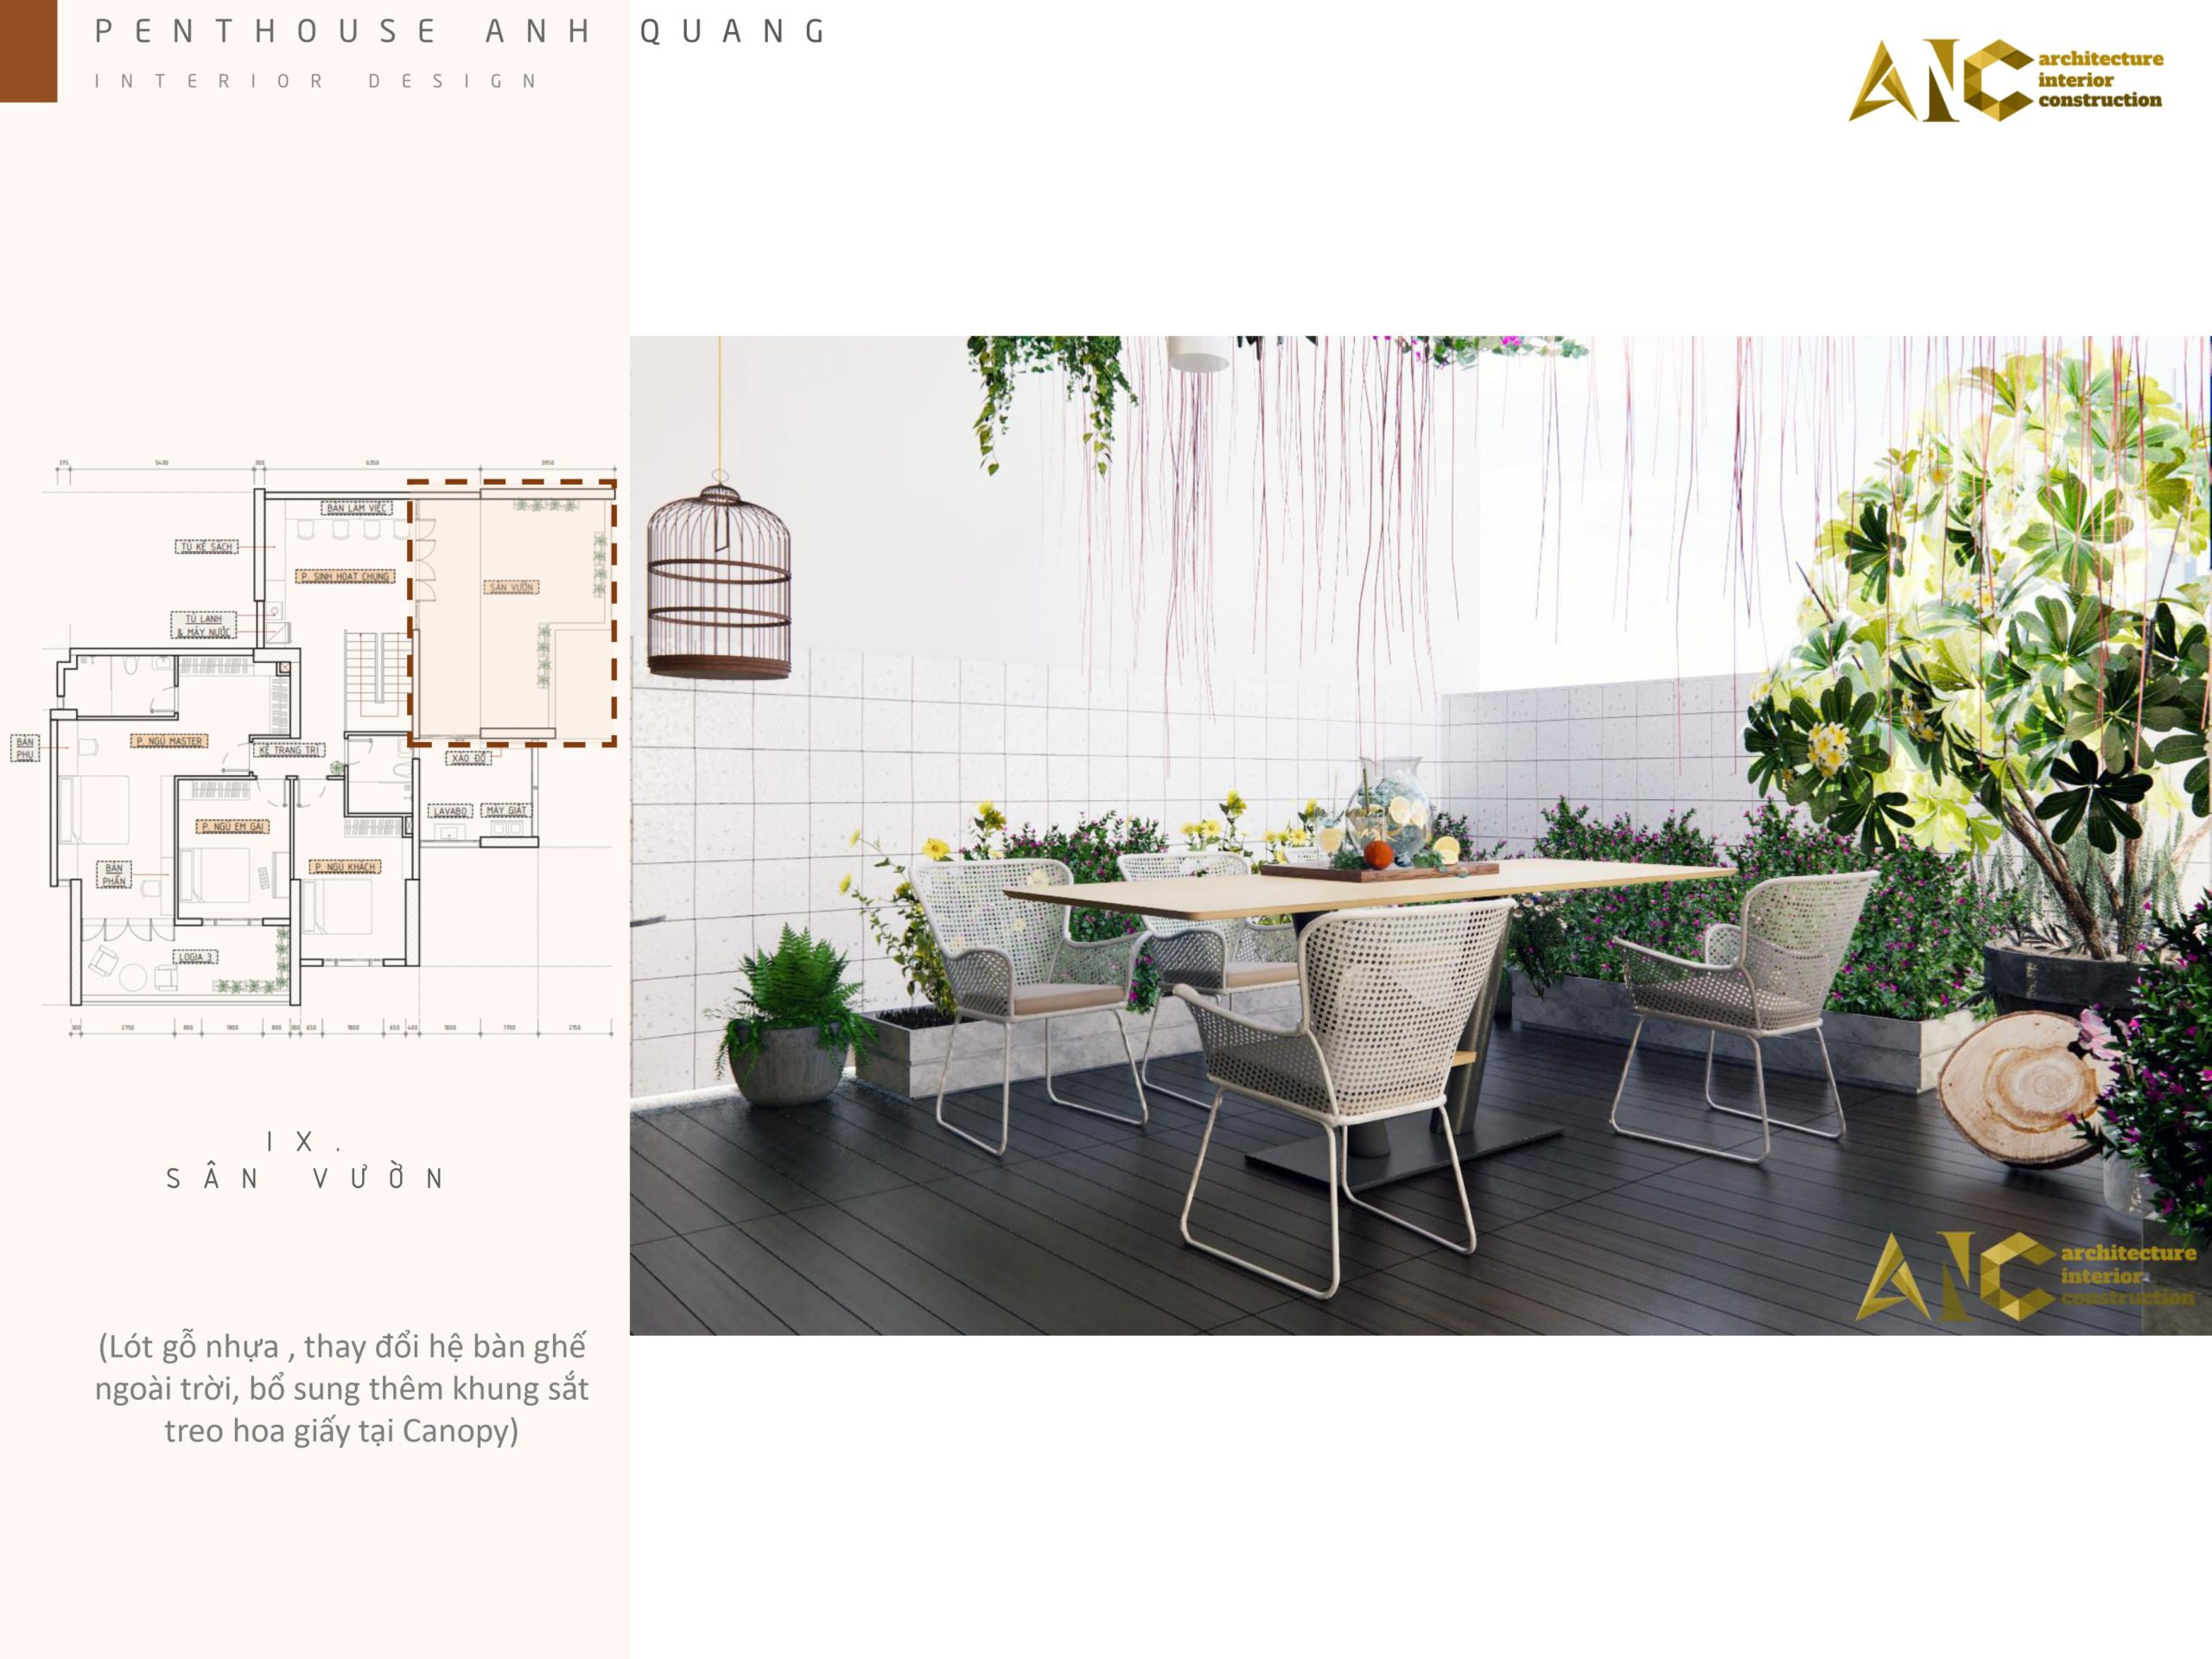 Penthouse-Anh-Quang-AIC-JSC-0033